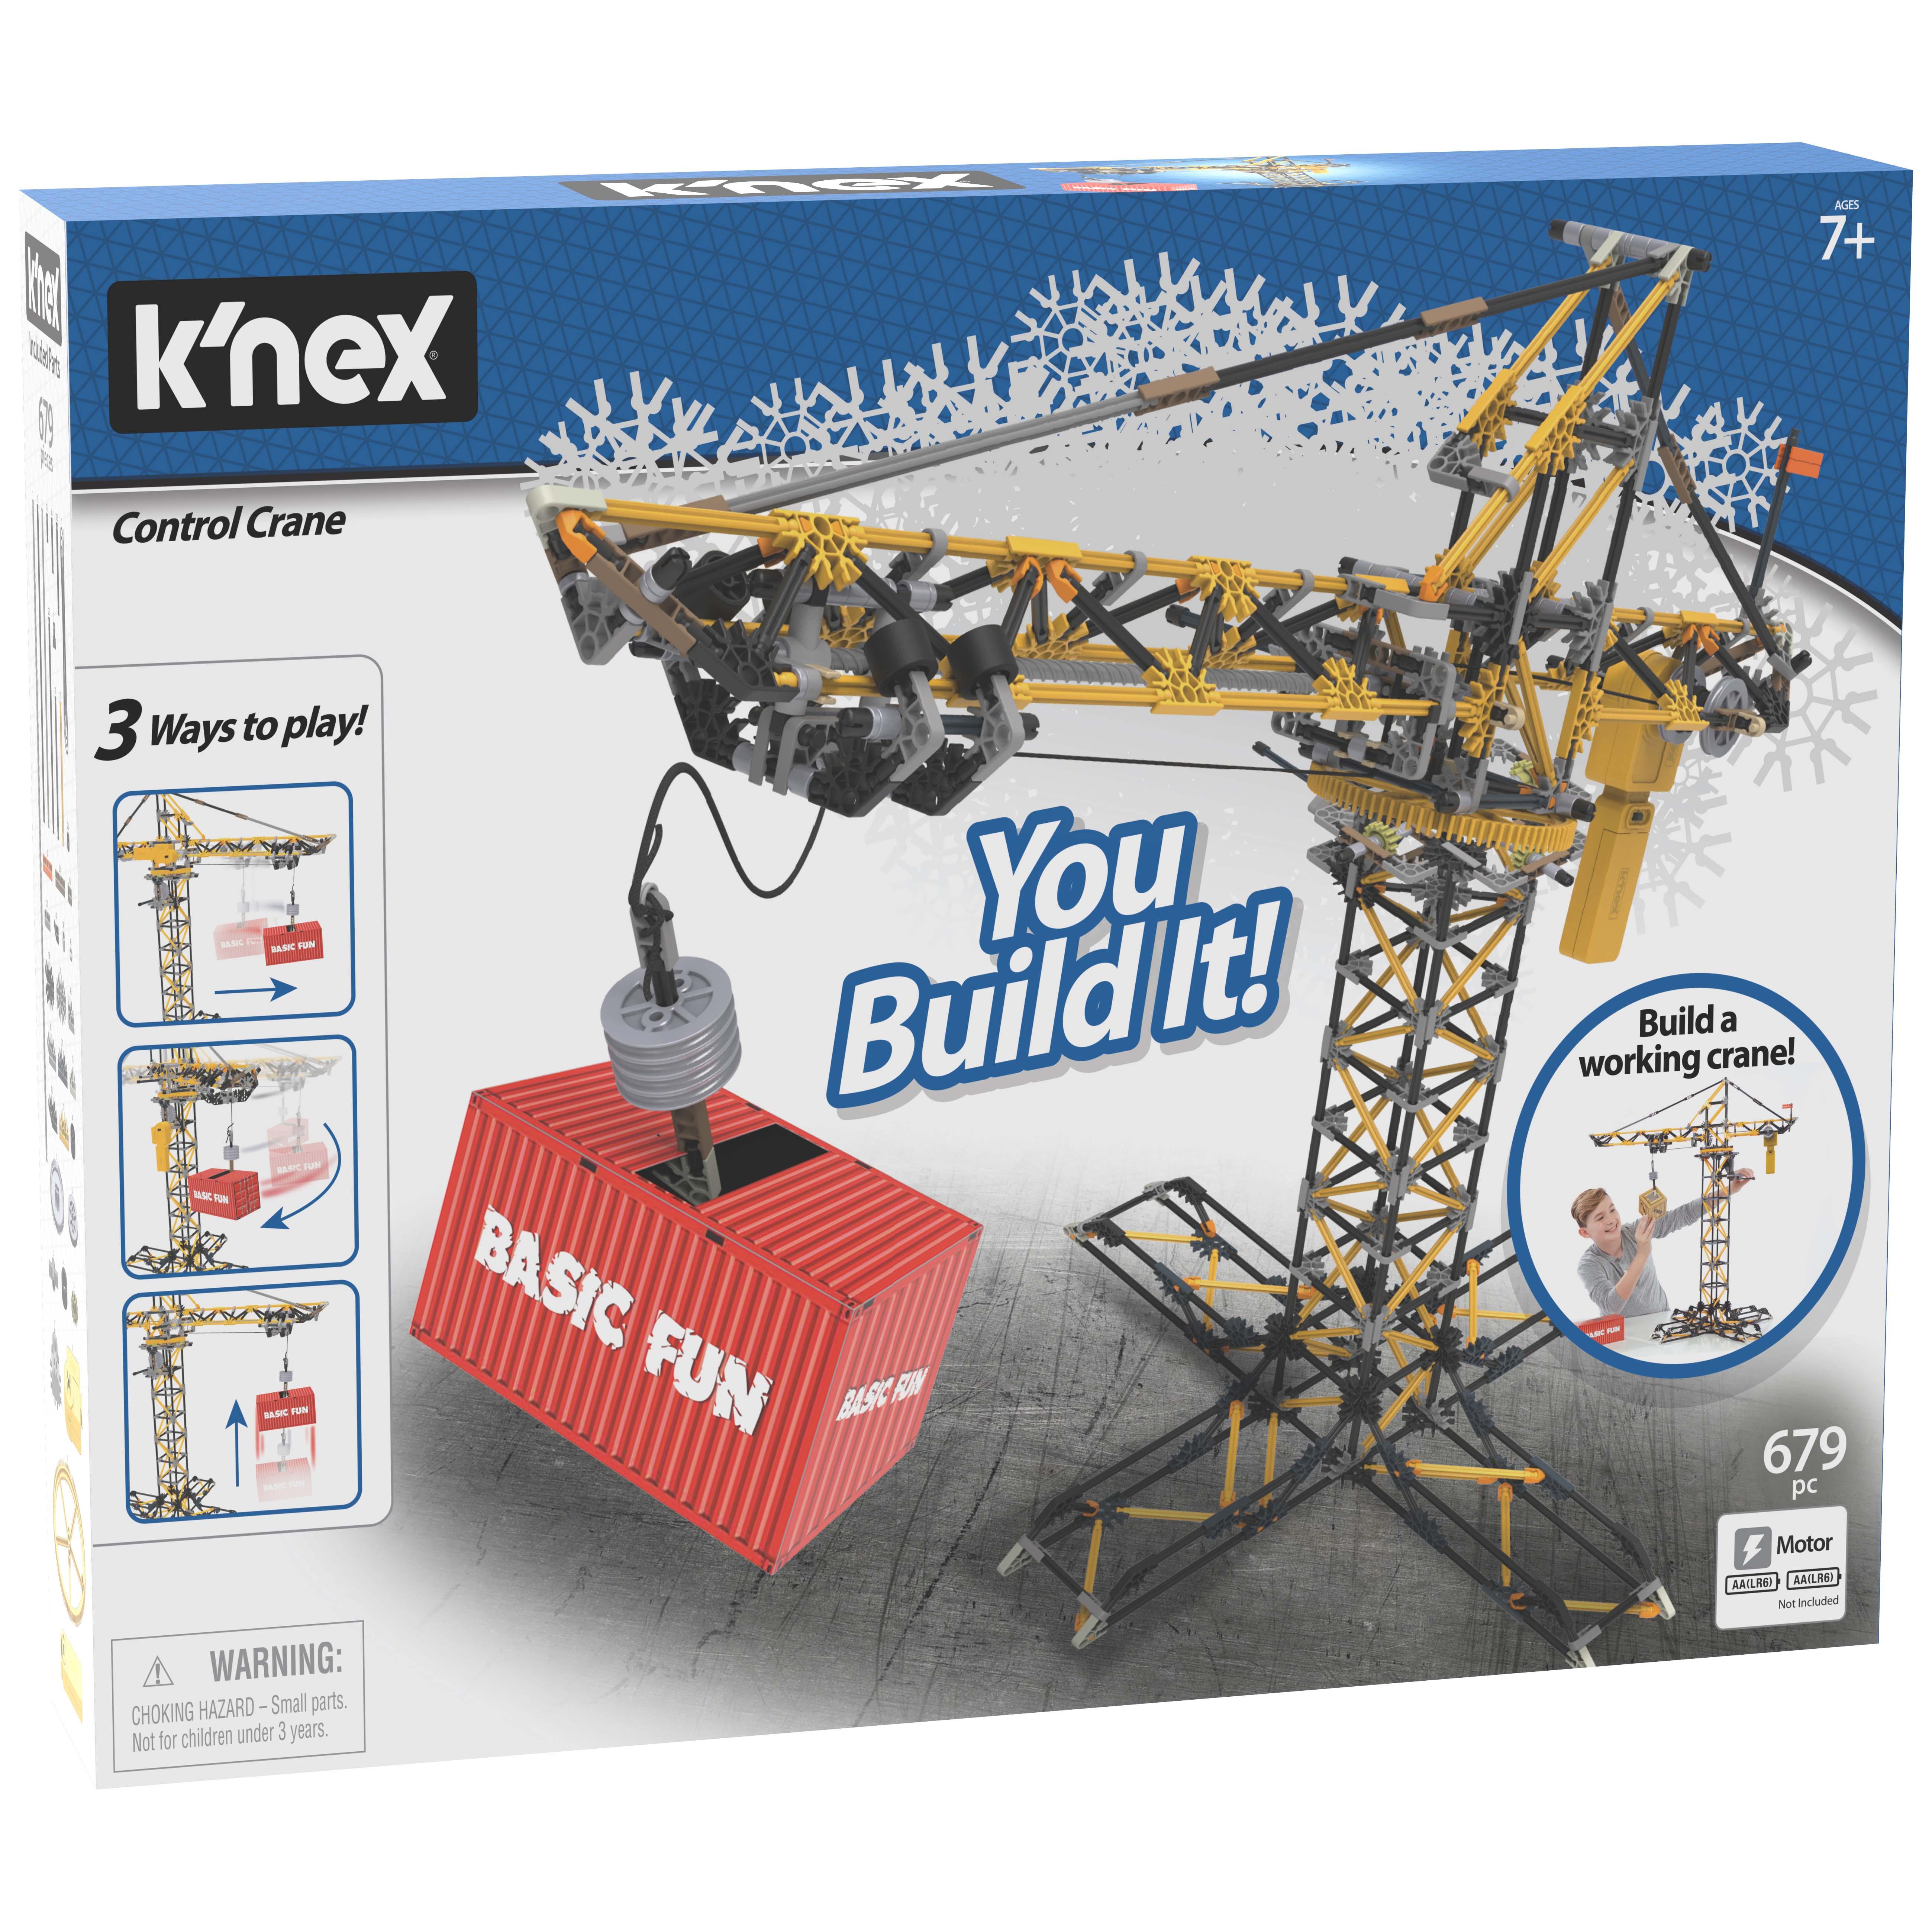 Afbeelding van K'nex Building Sets Control Crane Building Set